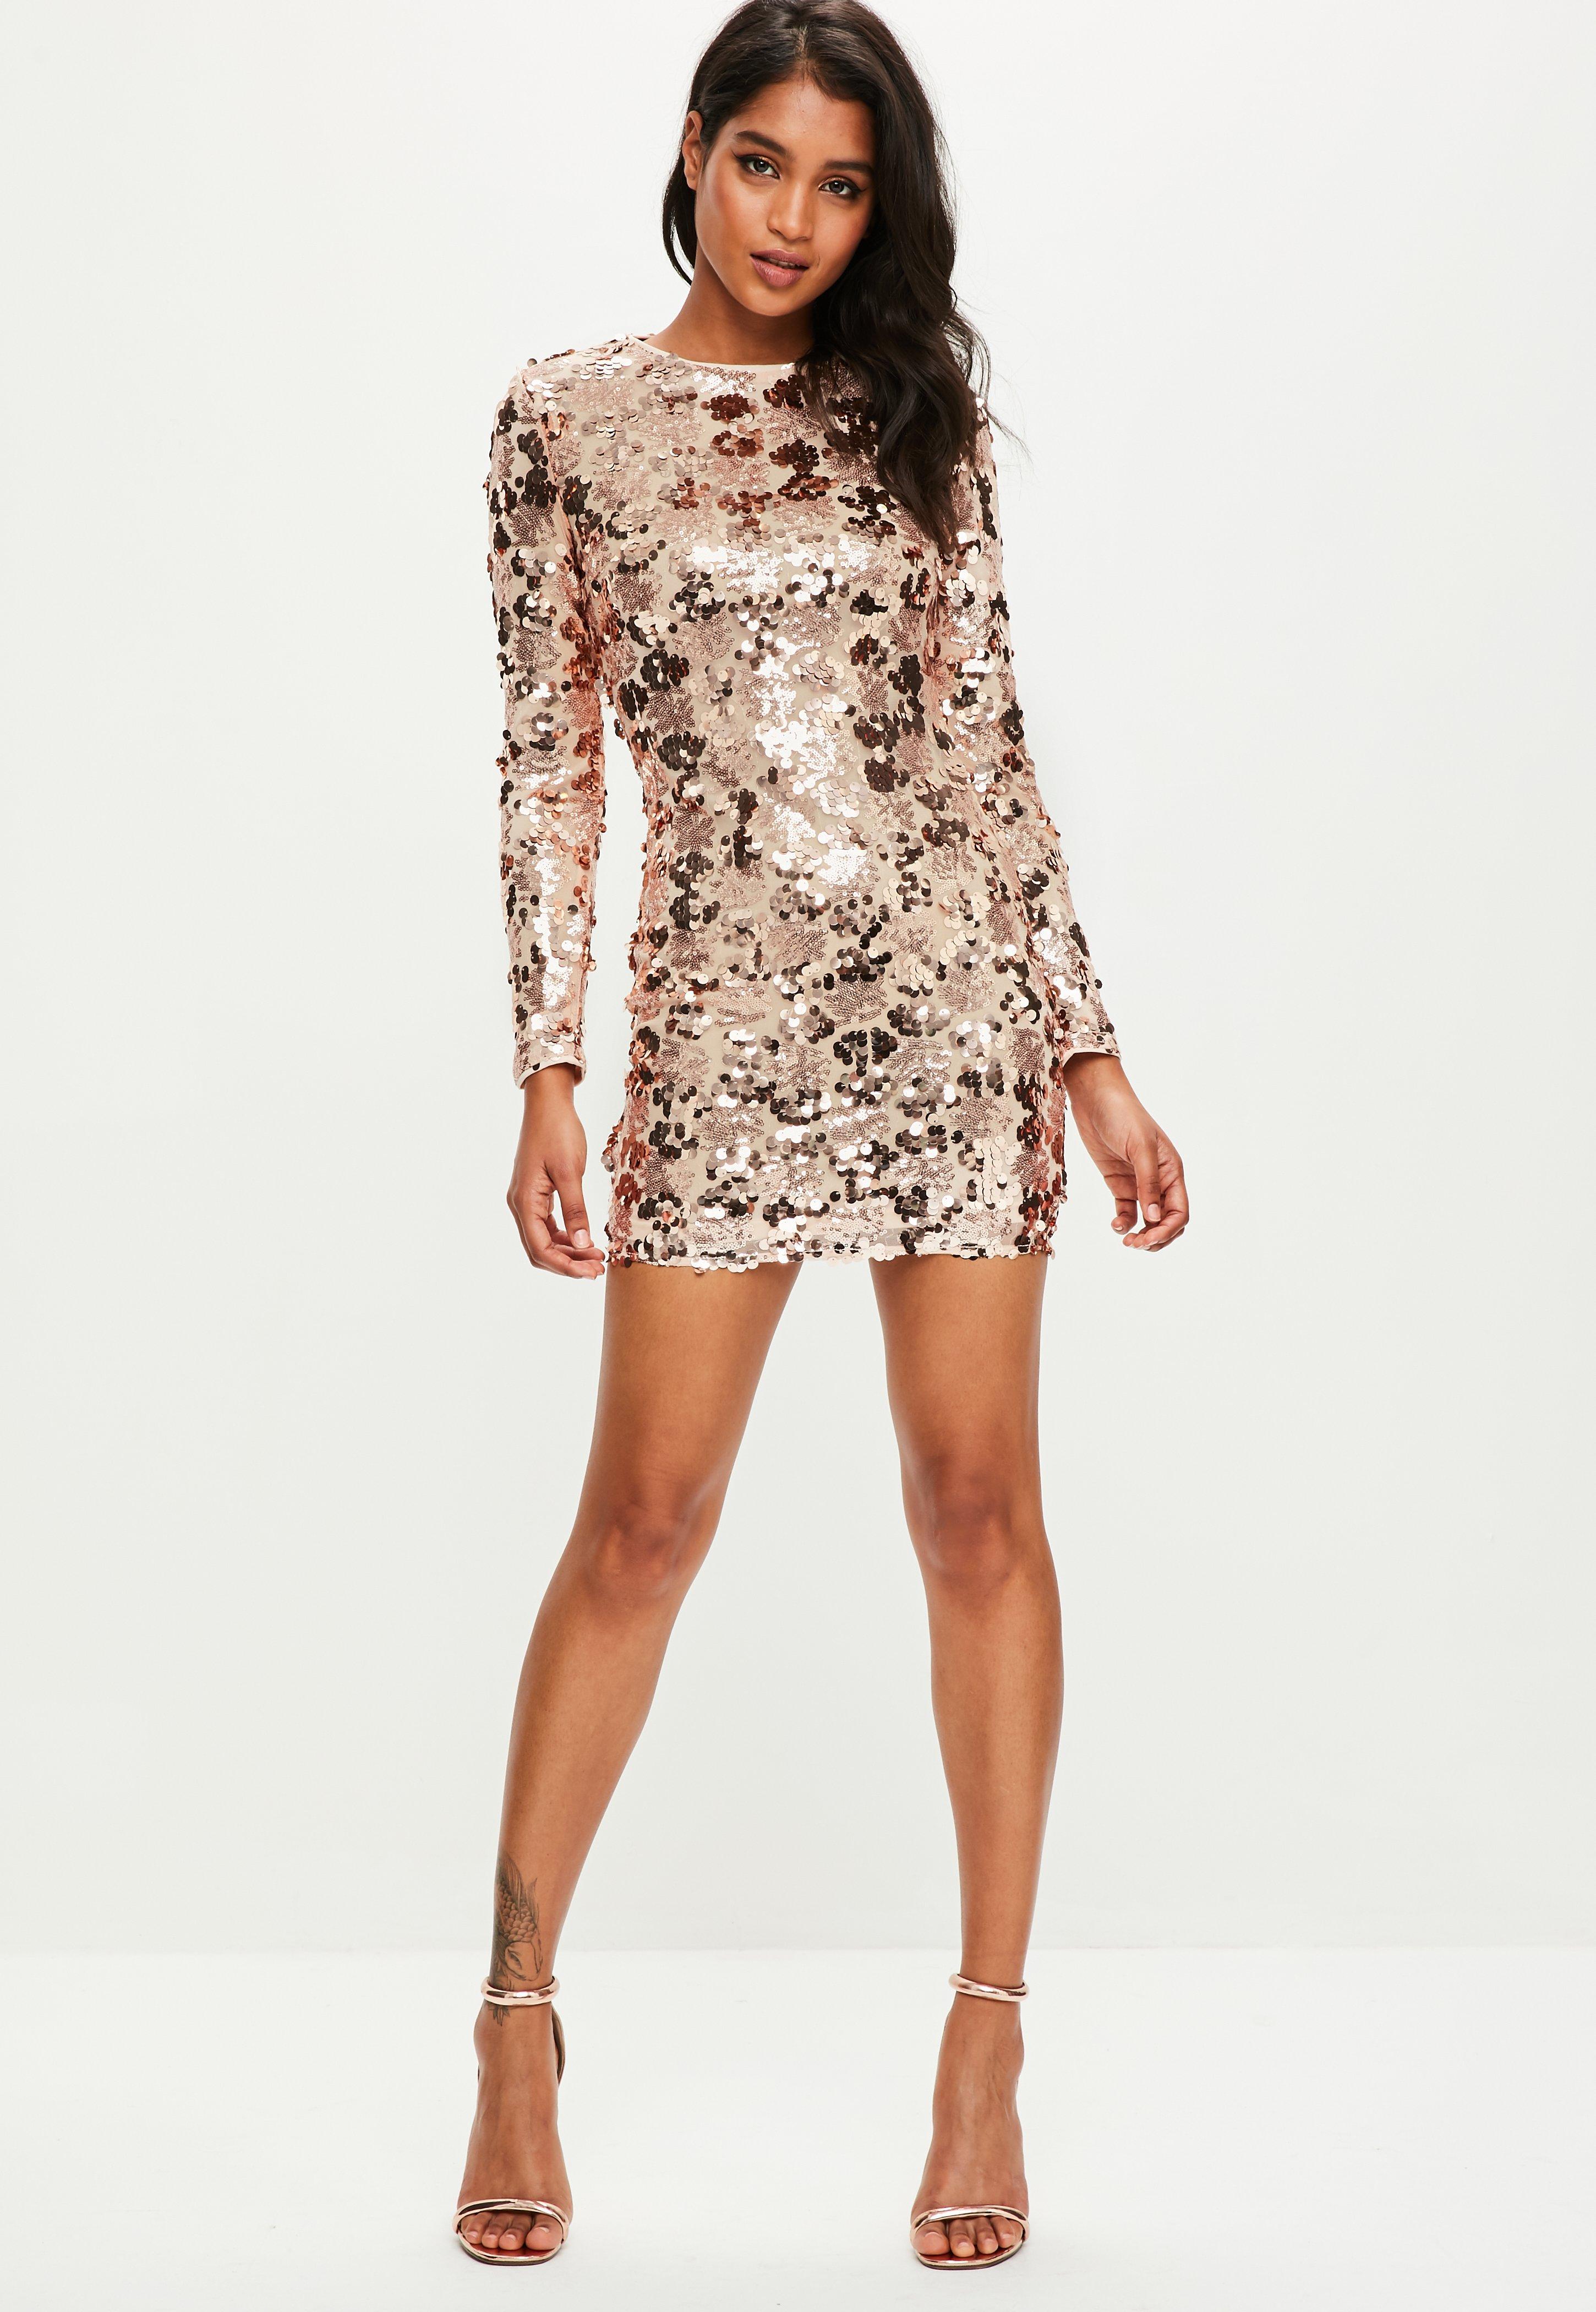 fc3c1b62f60 Gold Sequin Bodycon Prom Dress – DACC